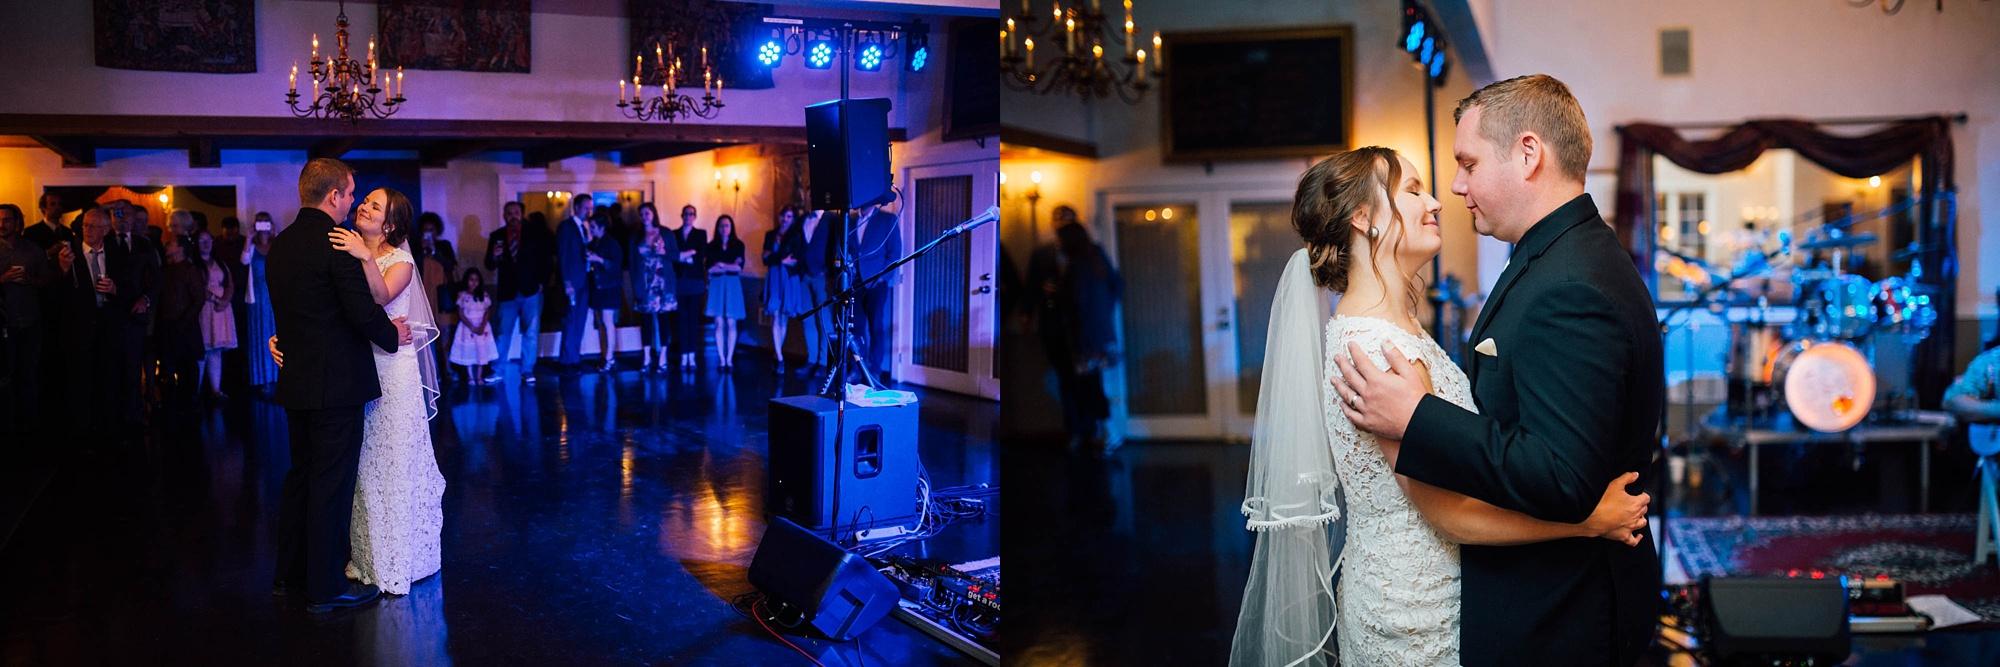 ashley_vos_seattle_ wedding_photographer_0202.jpg